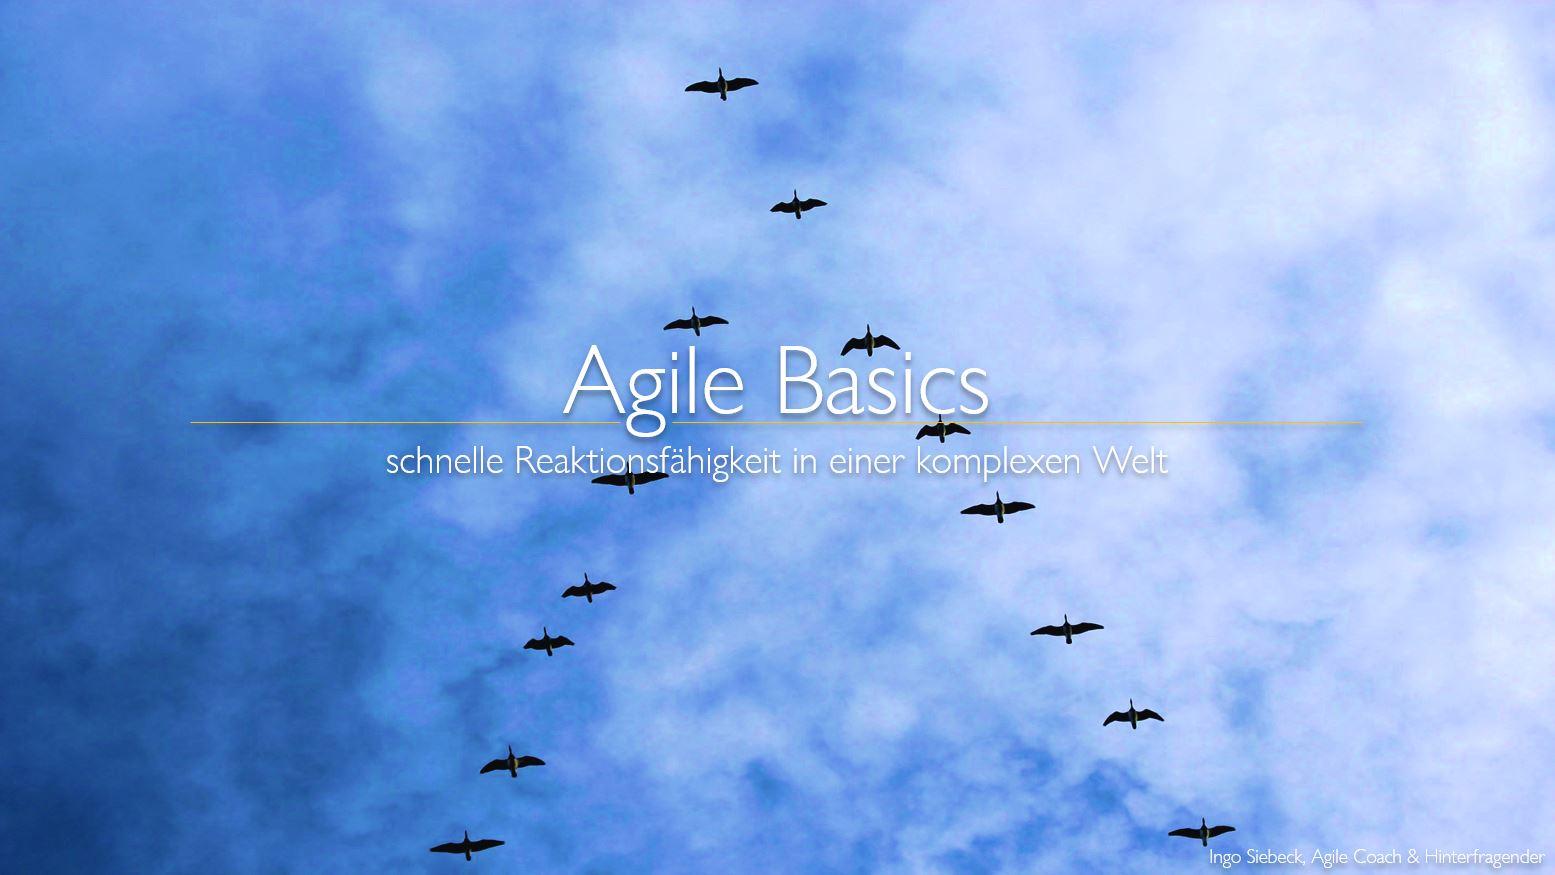 Agile Basics Seminar Ingo Siebeck